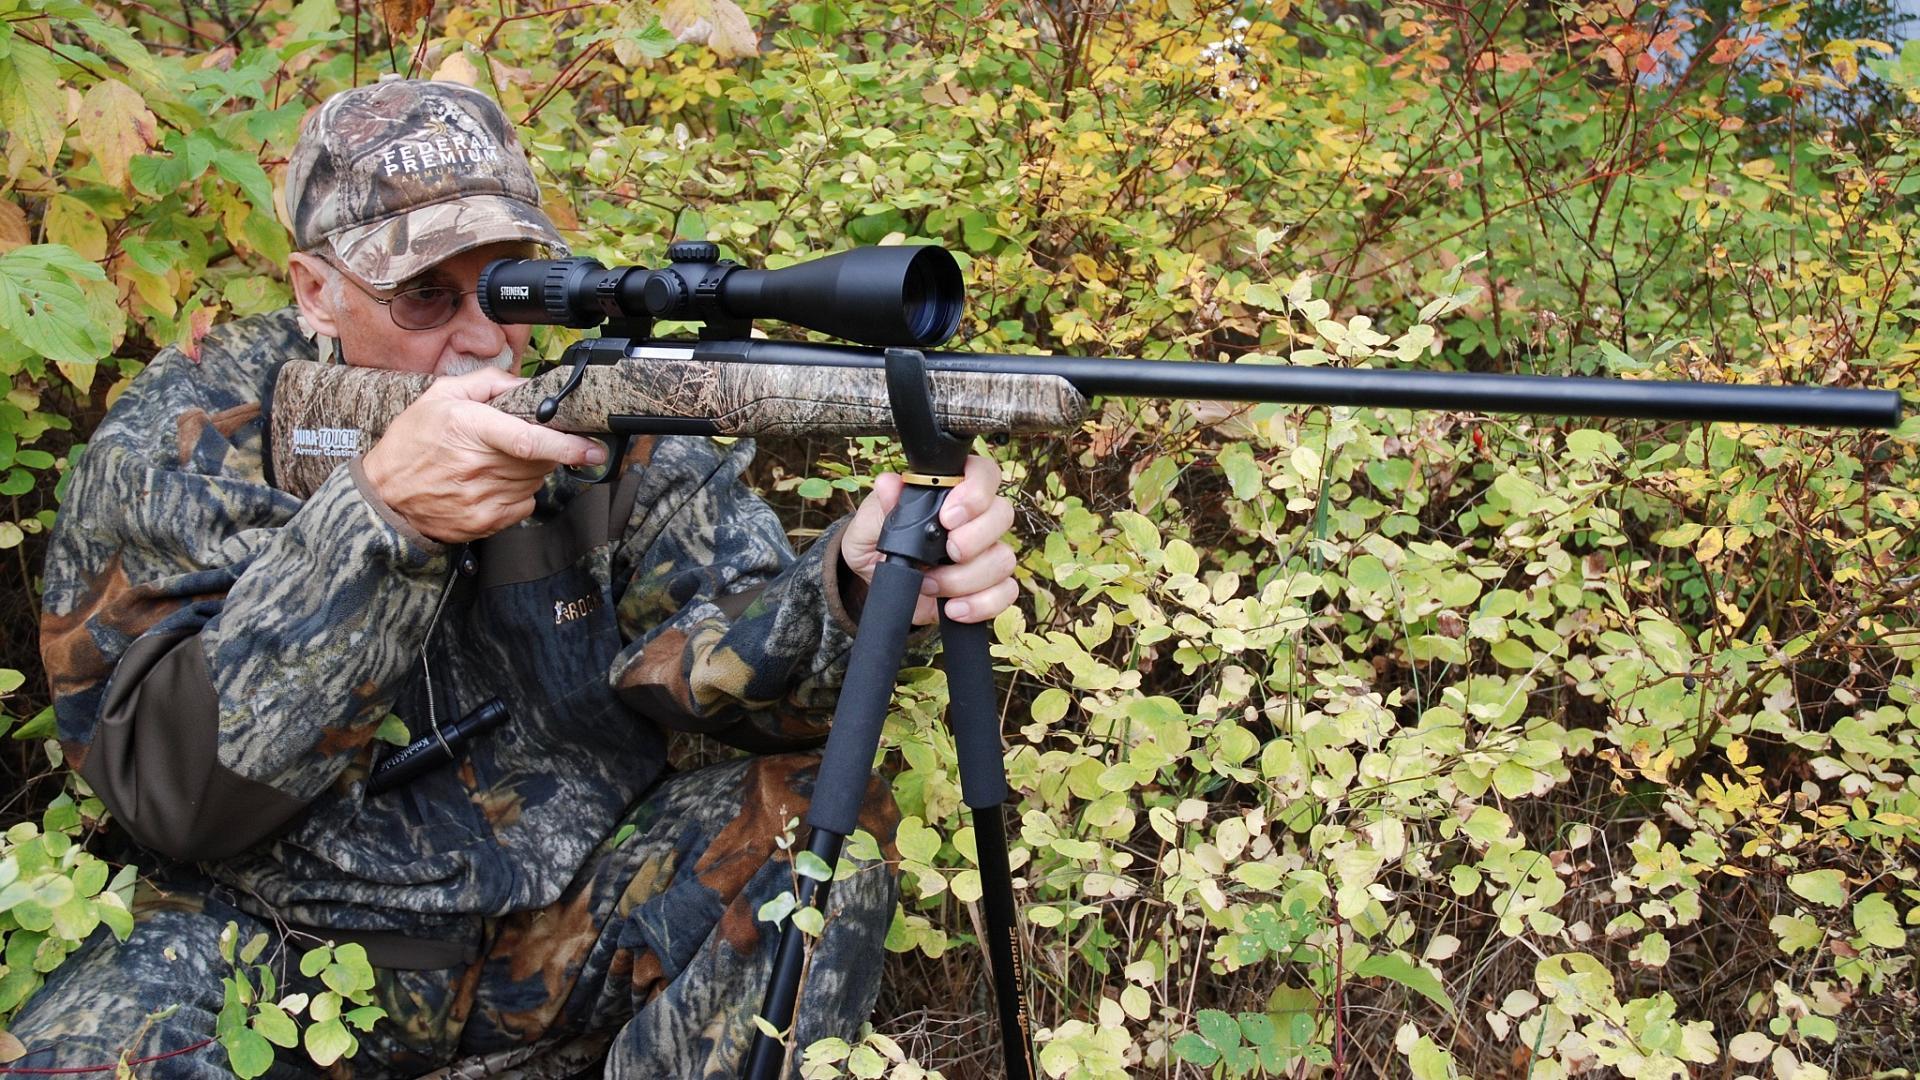 Gun Review: Browning's X-Bolt Varmint Stalker Offers Consistent